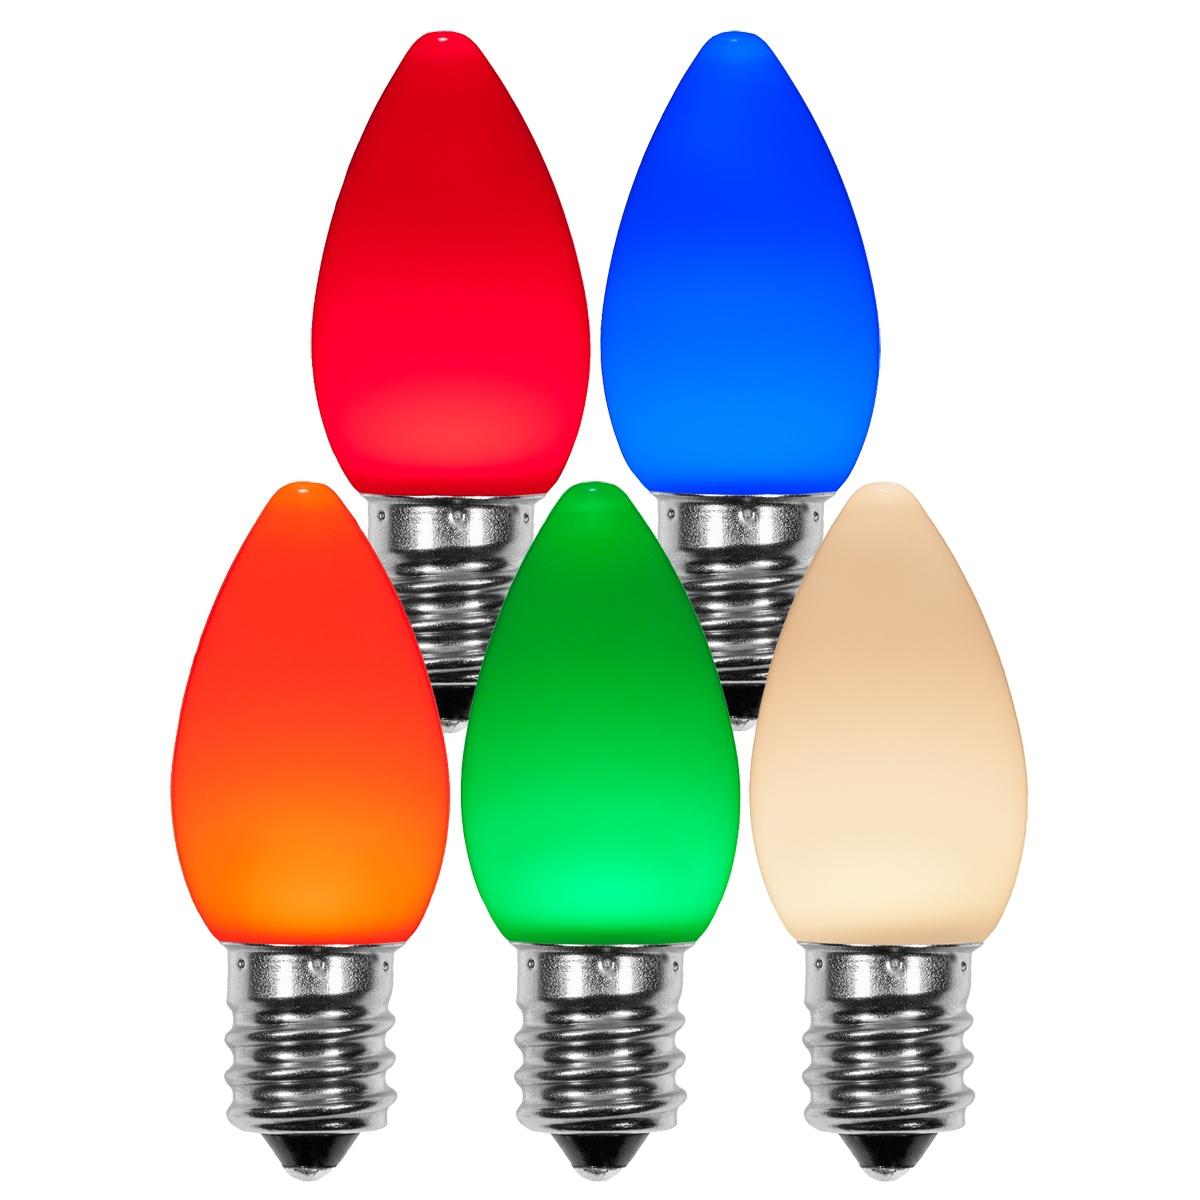 Replacement Mini Led Christmas Light Bulbs